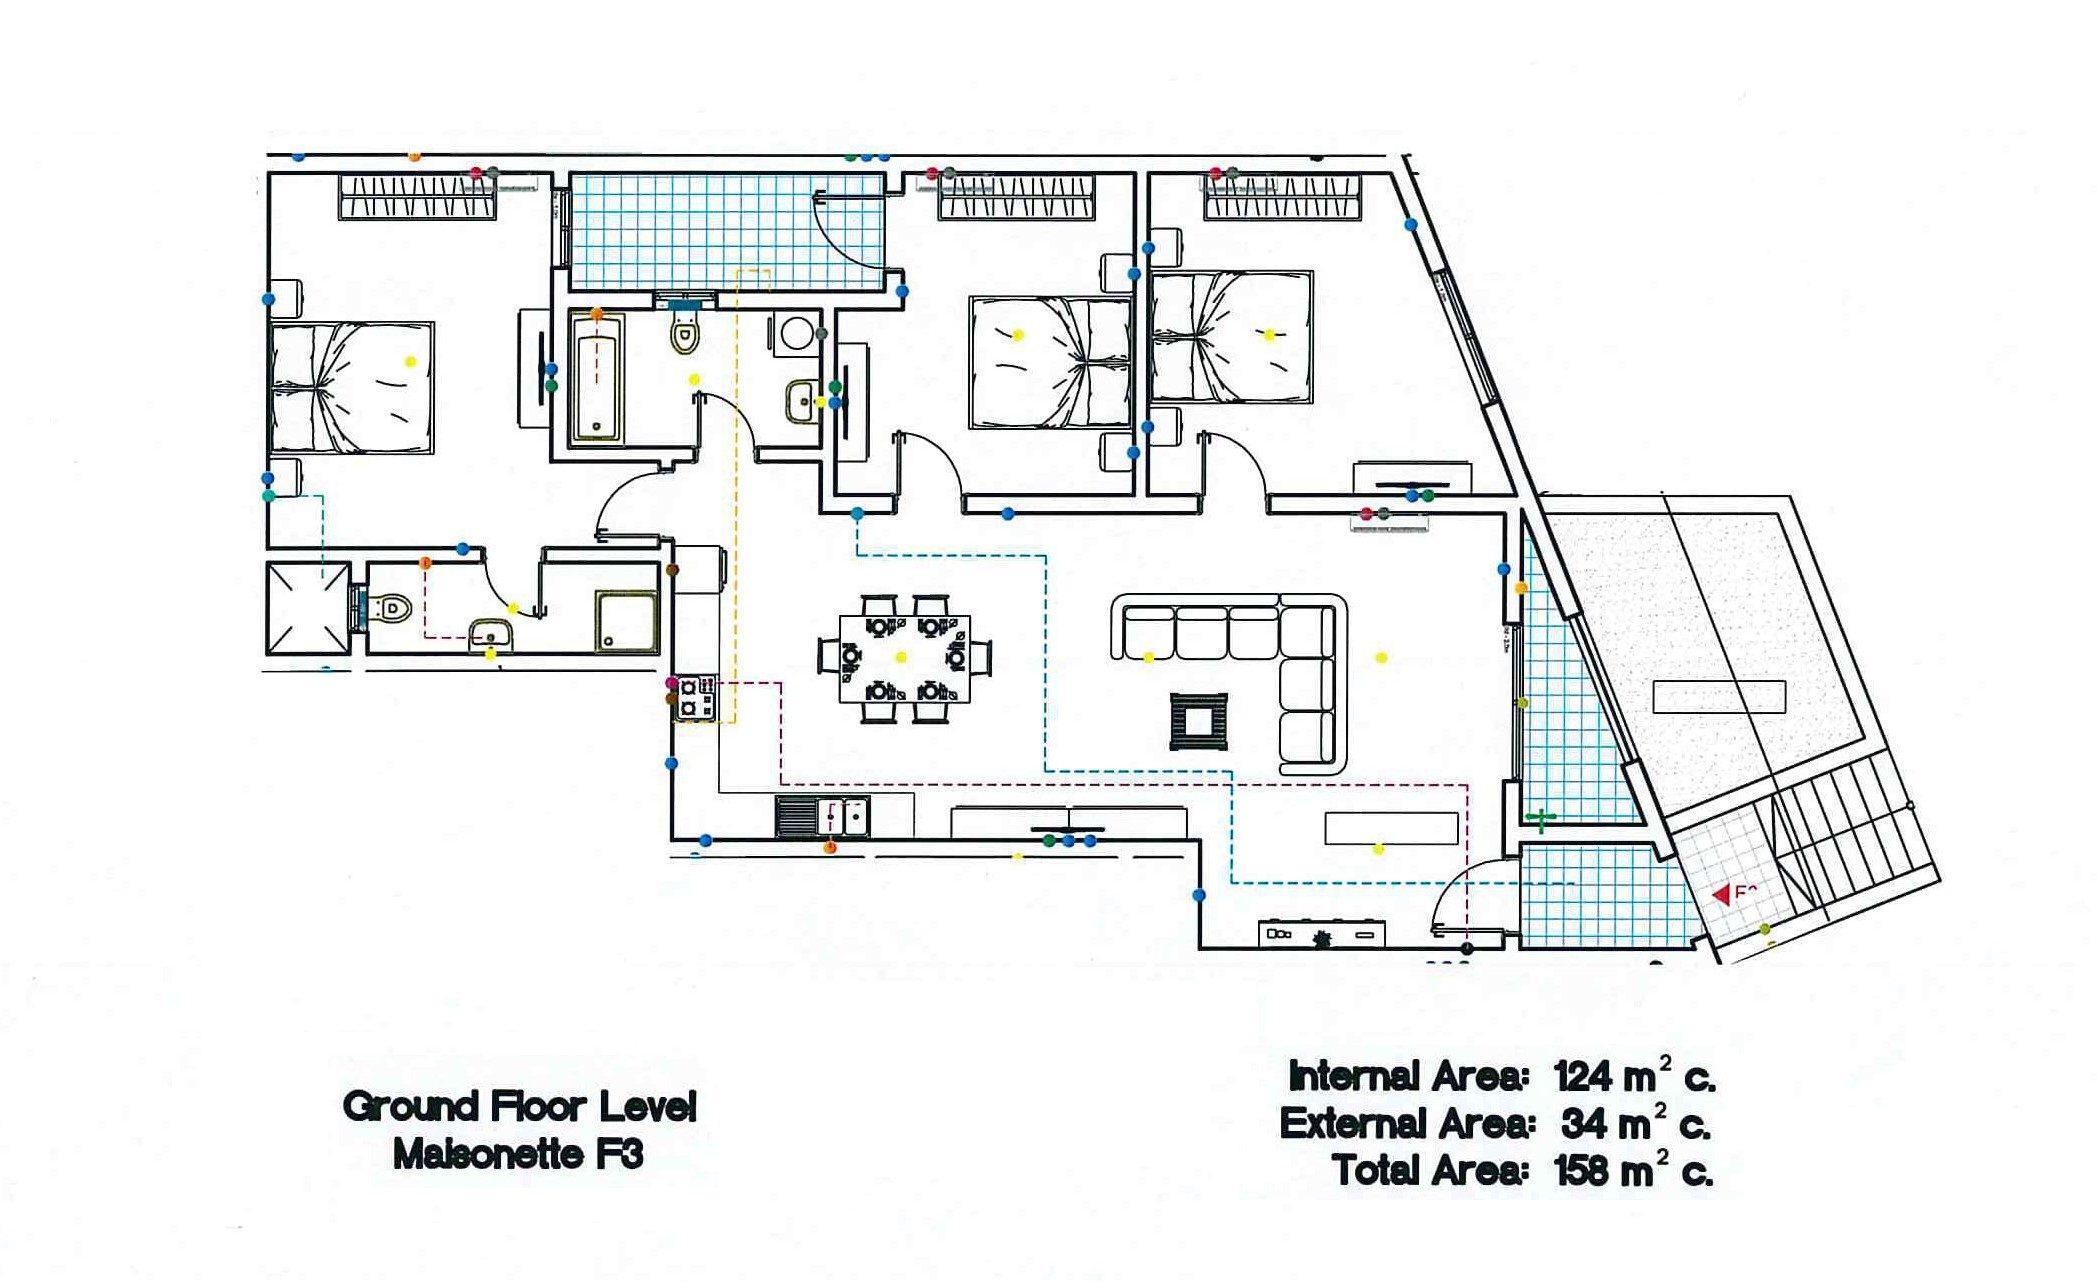 Block F - Ground Floor Maiosnette F3